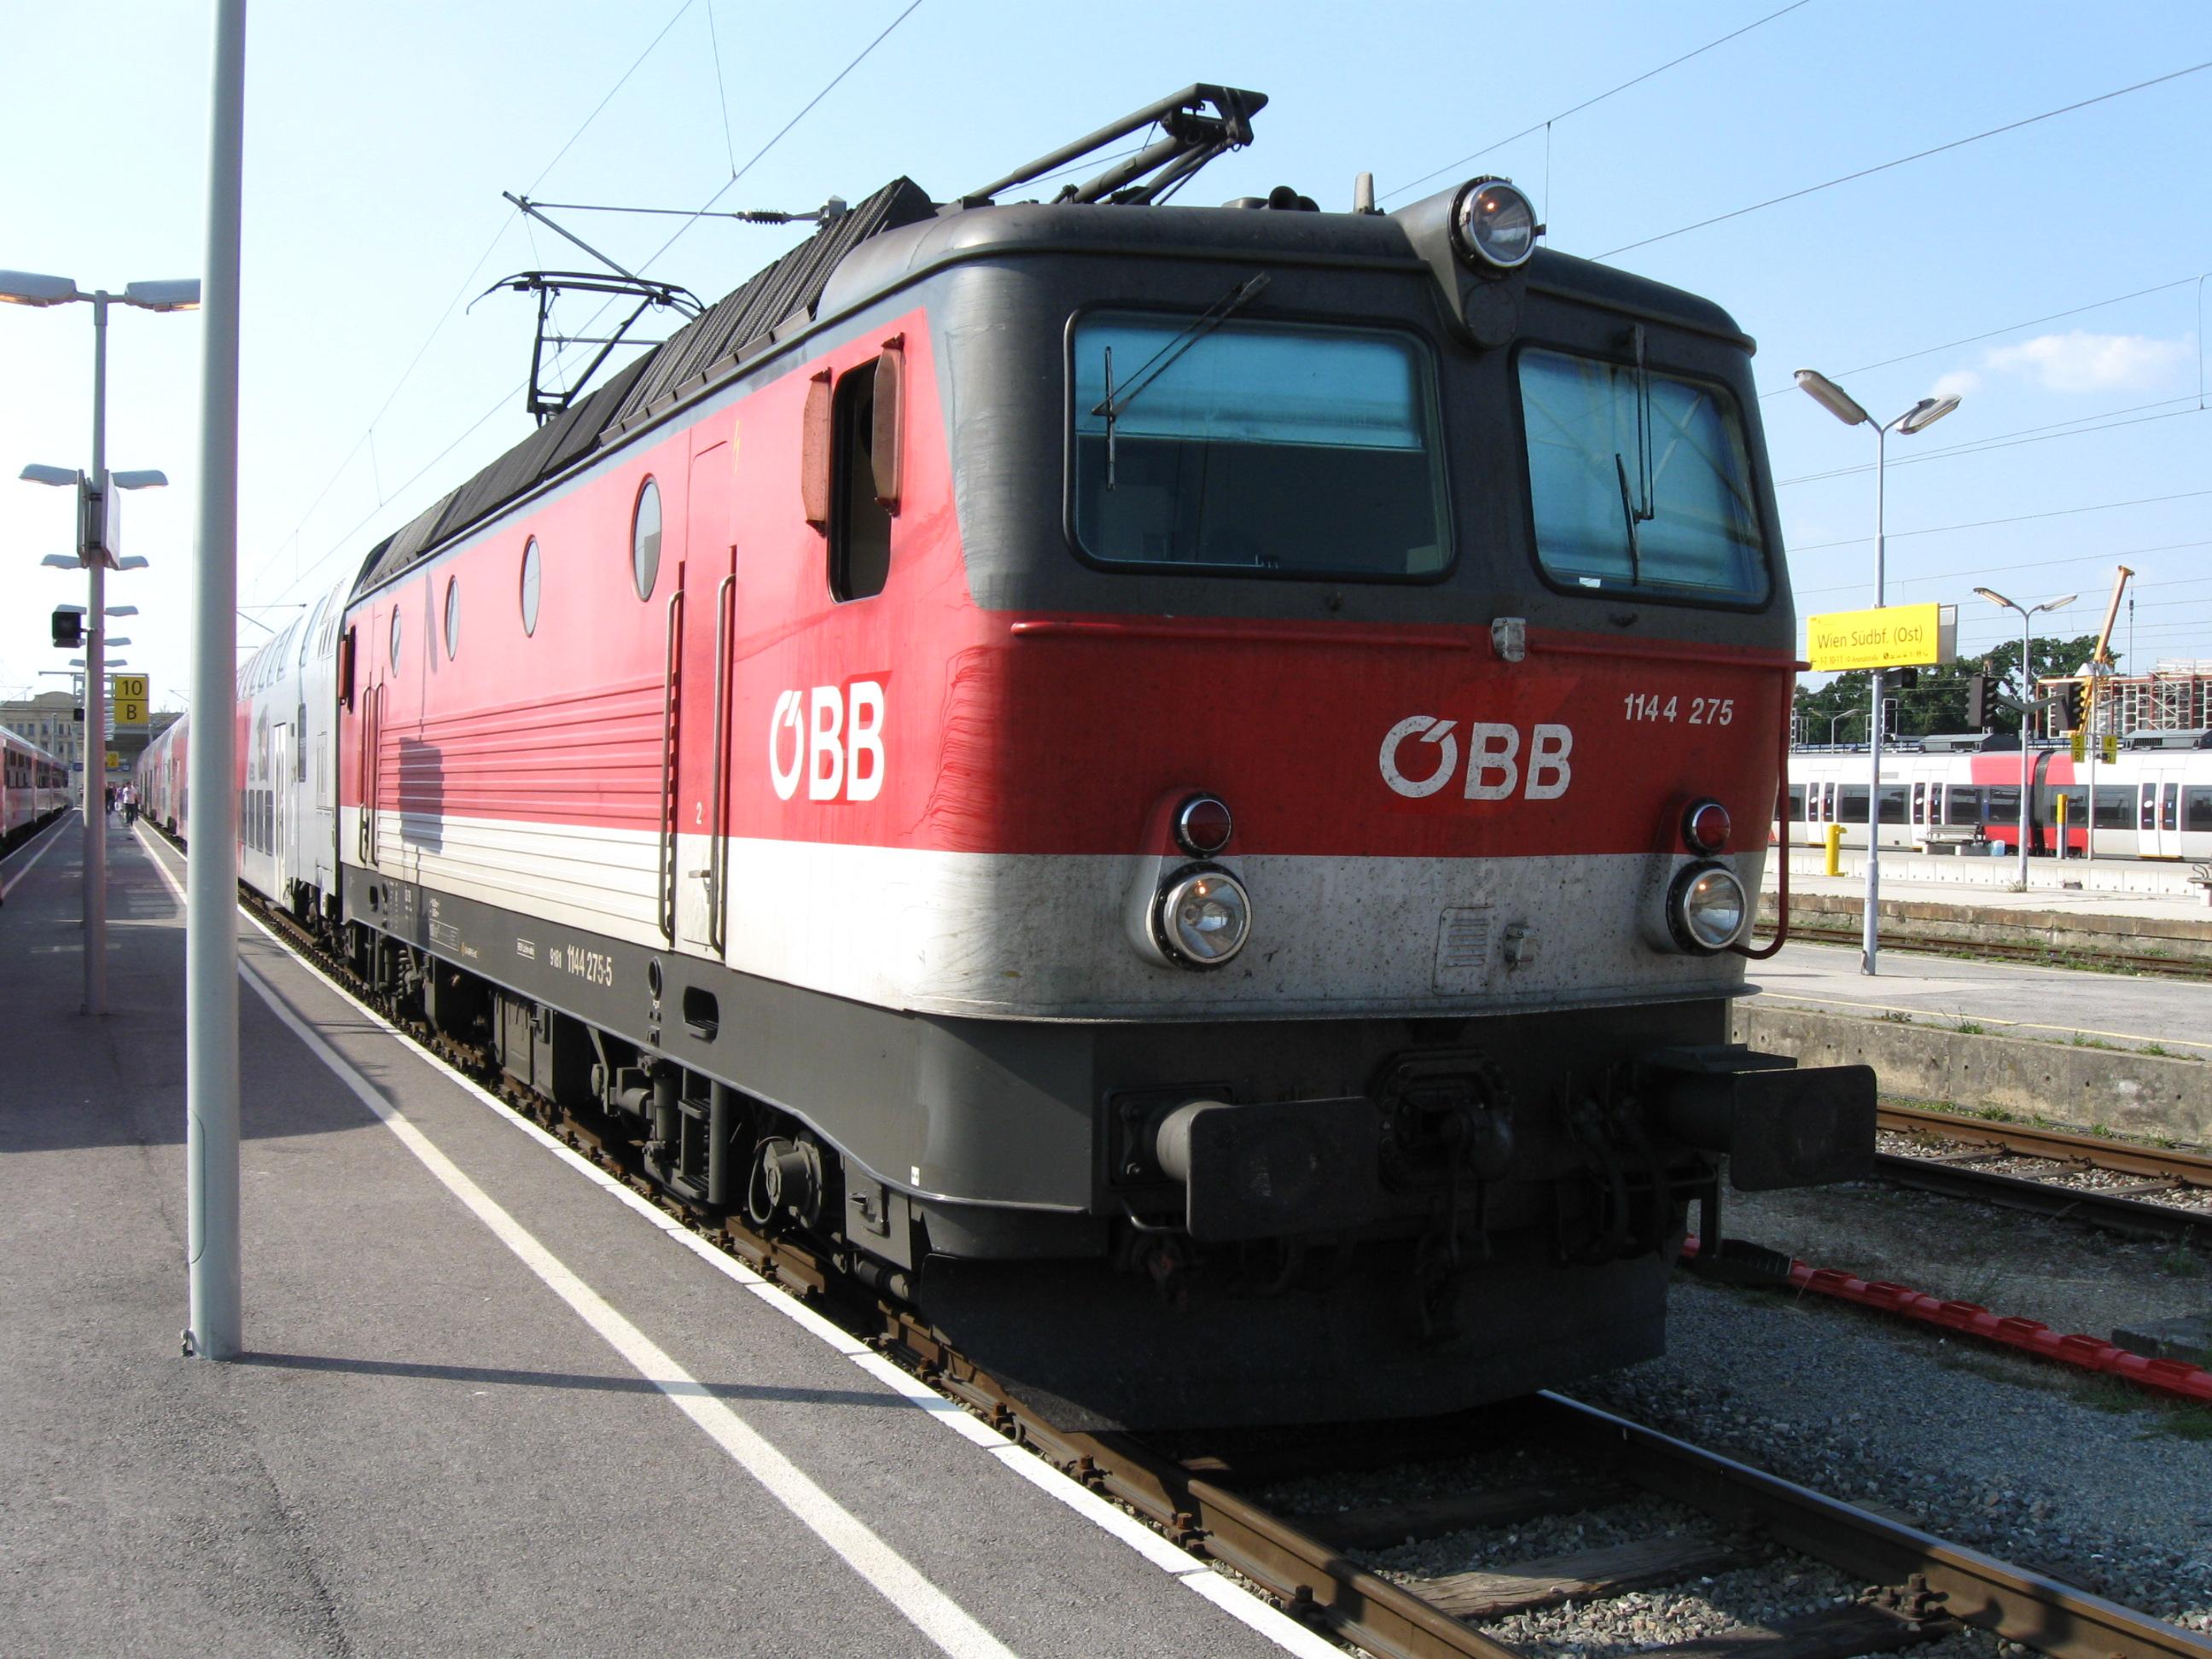 File:ÖBB 1144 275.jpg